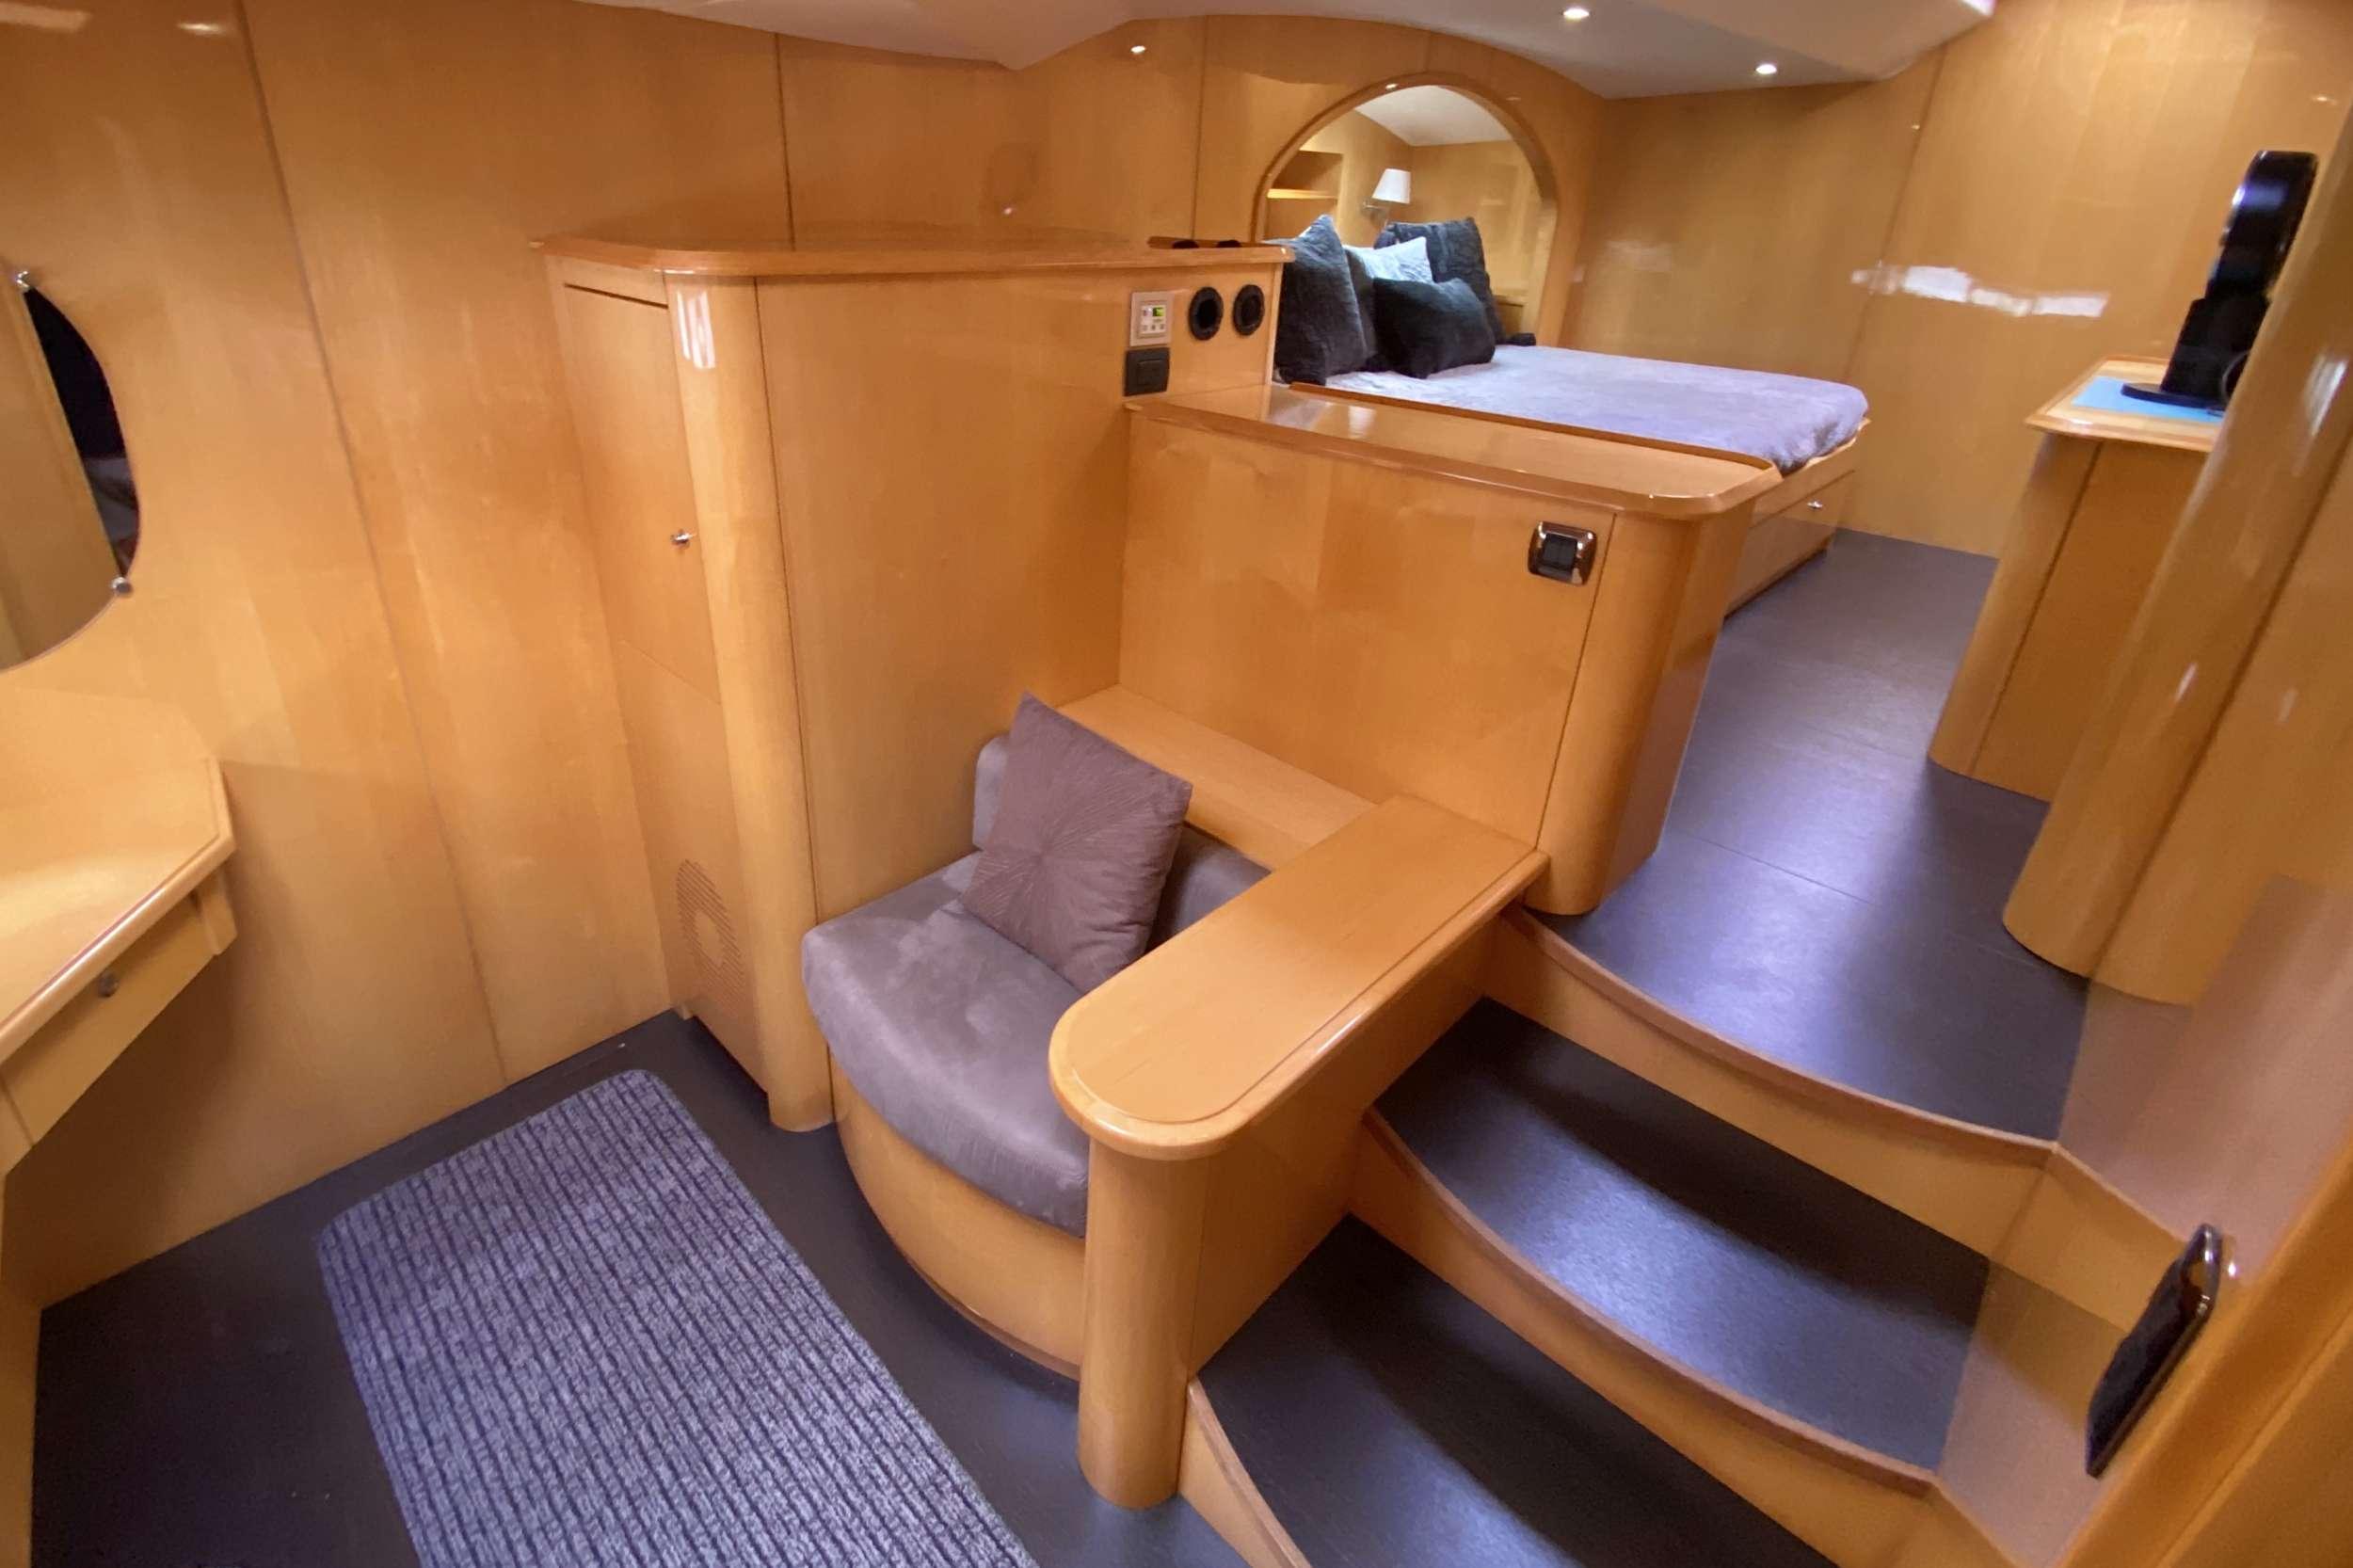 TRES SUENOS yacht image # 6